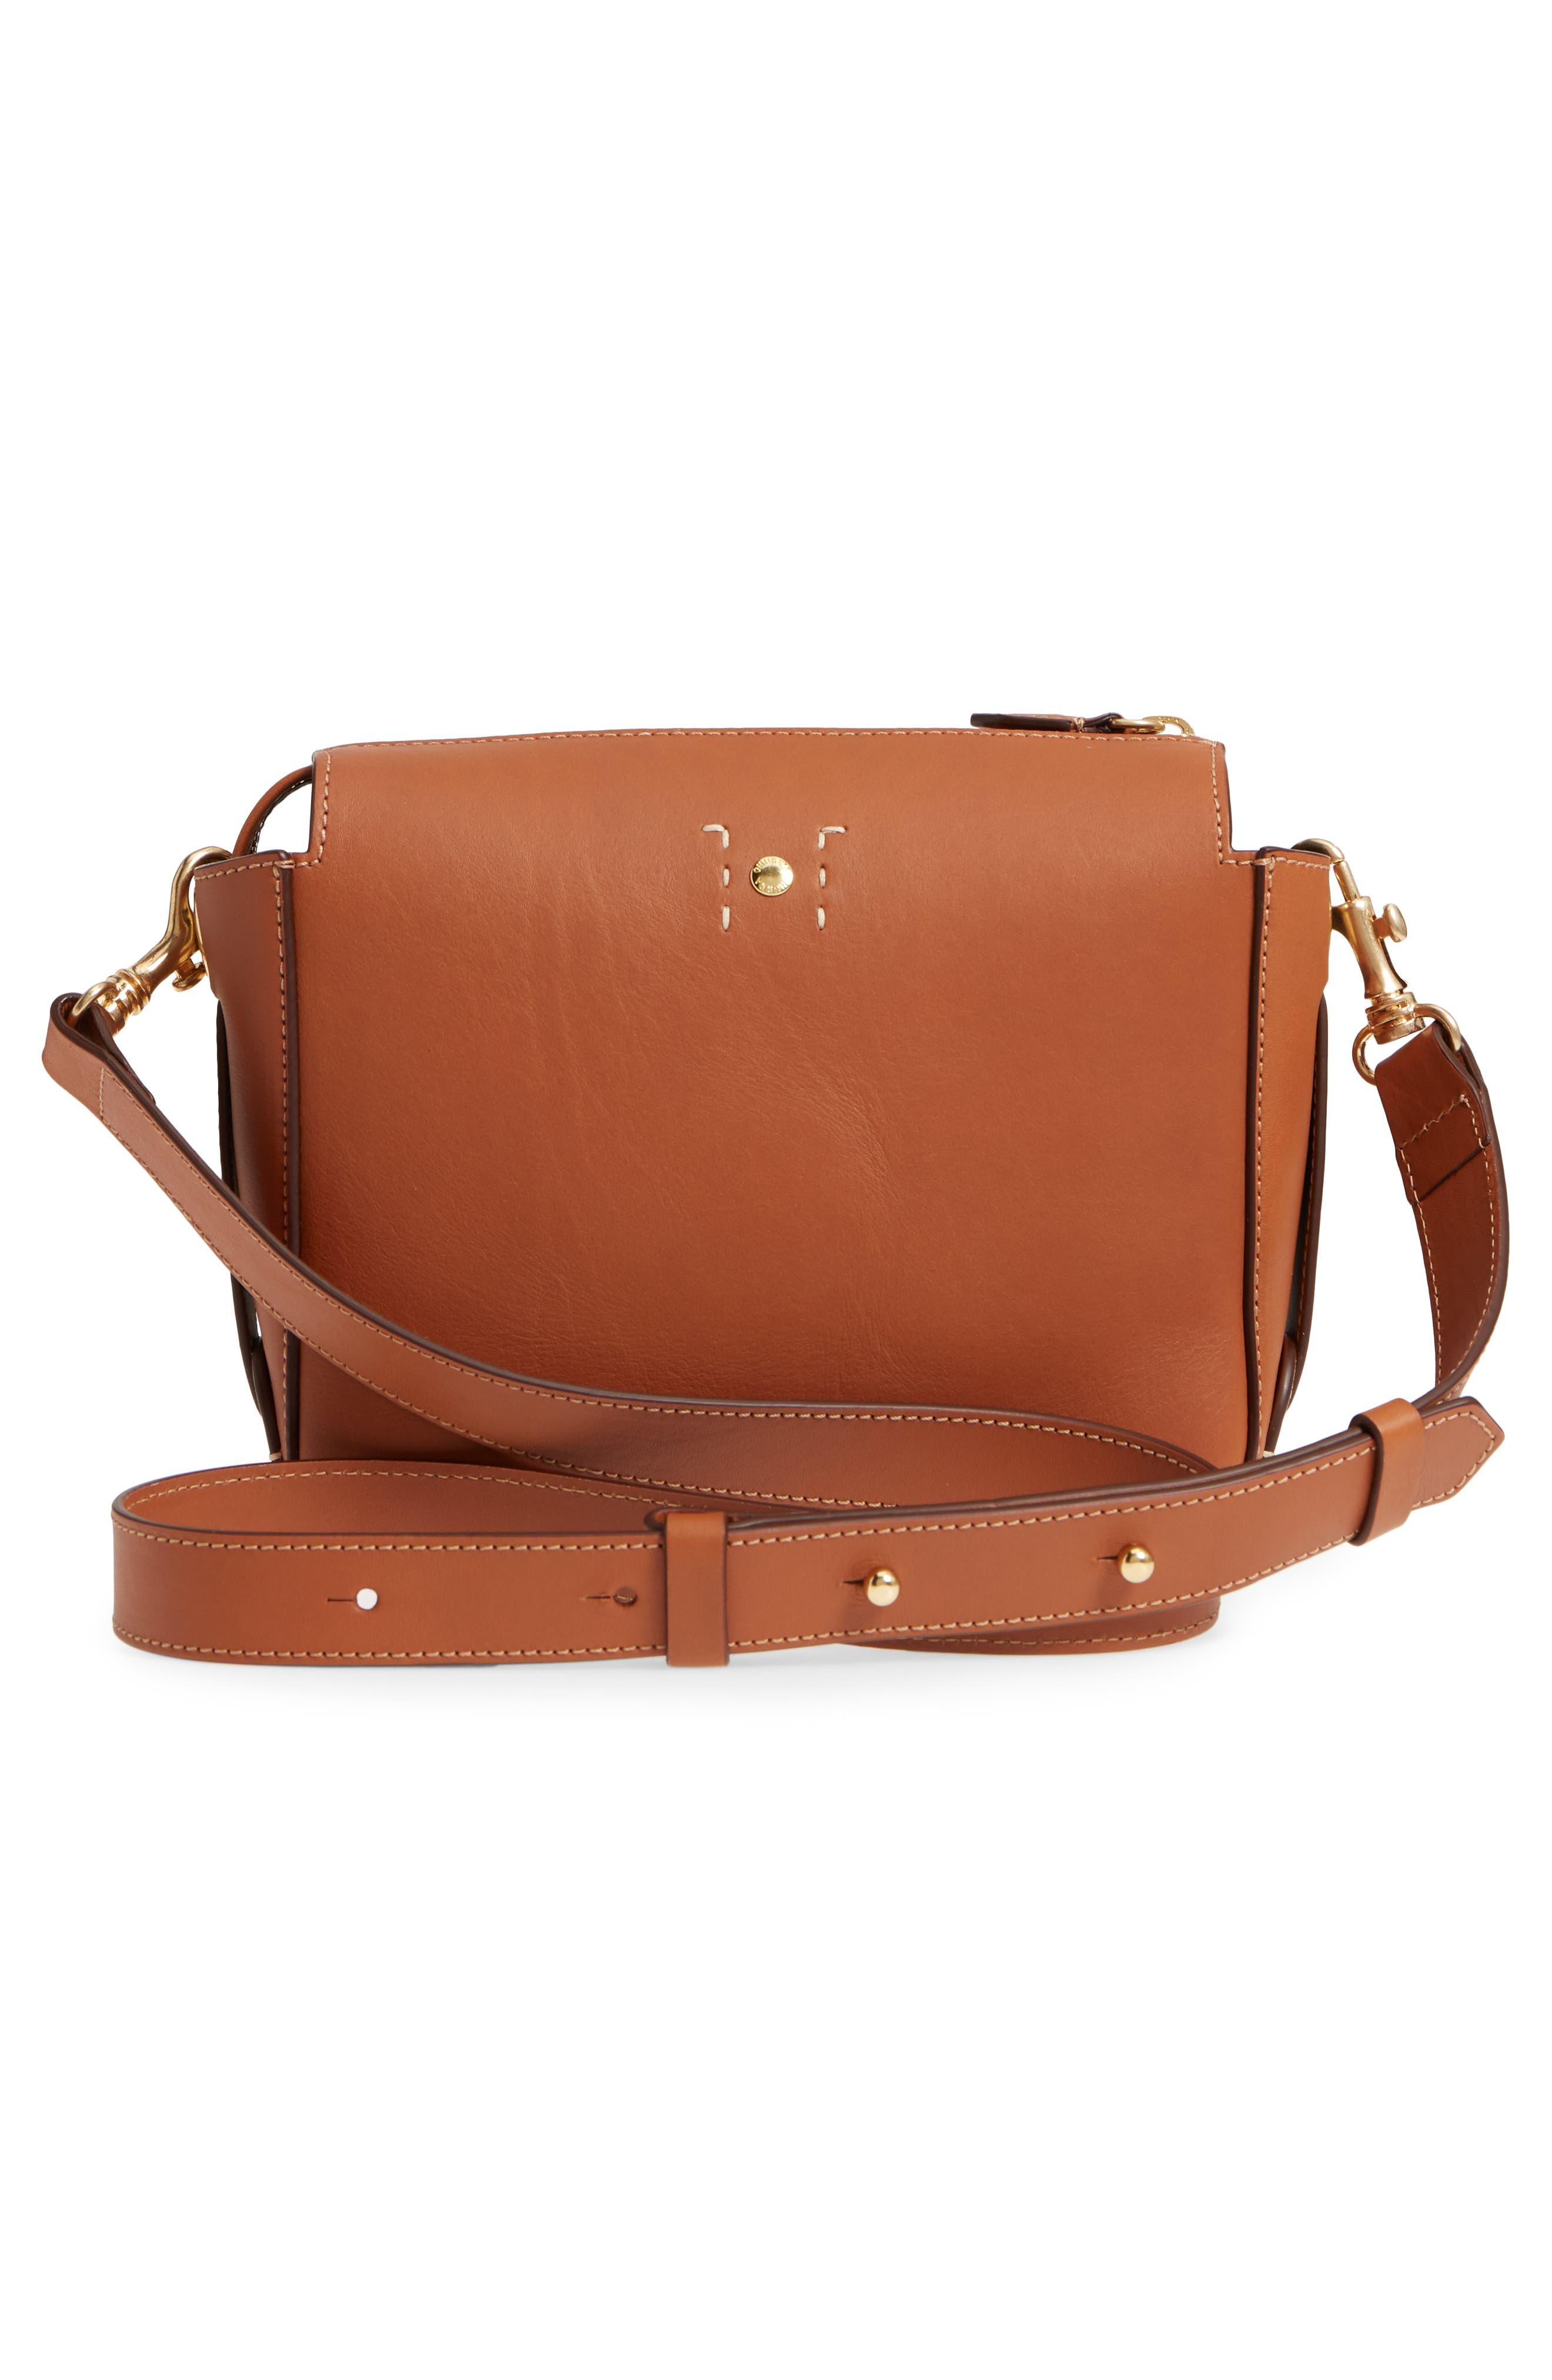 Tilley Leather Crossbody Bag,                             Alternate thumbnail 3, color,                             CHESTNUT